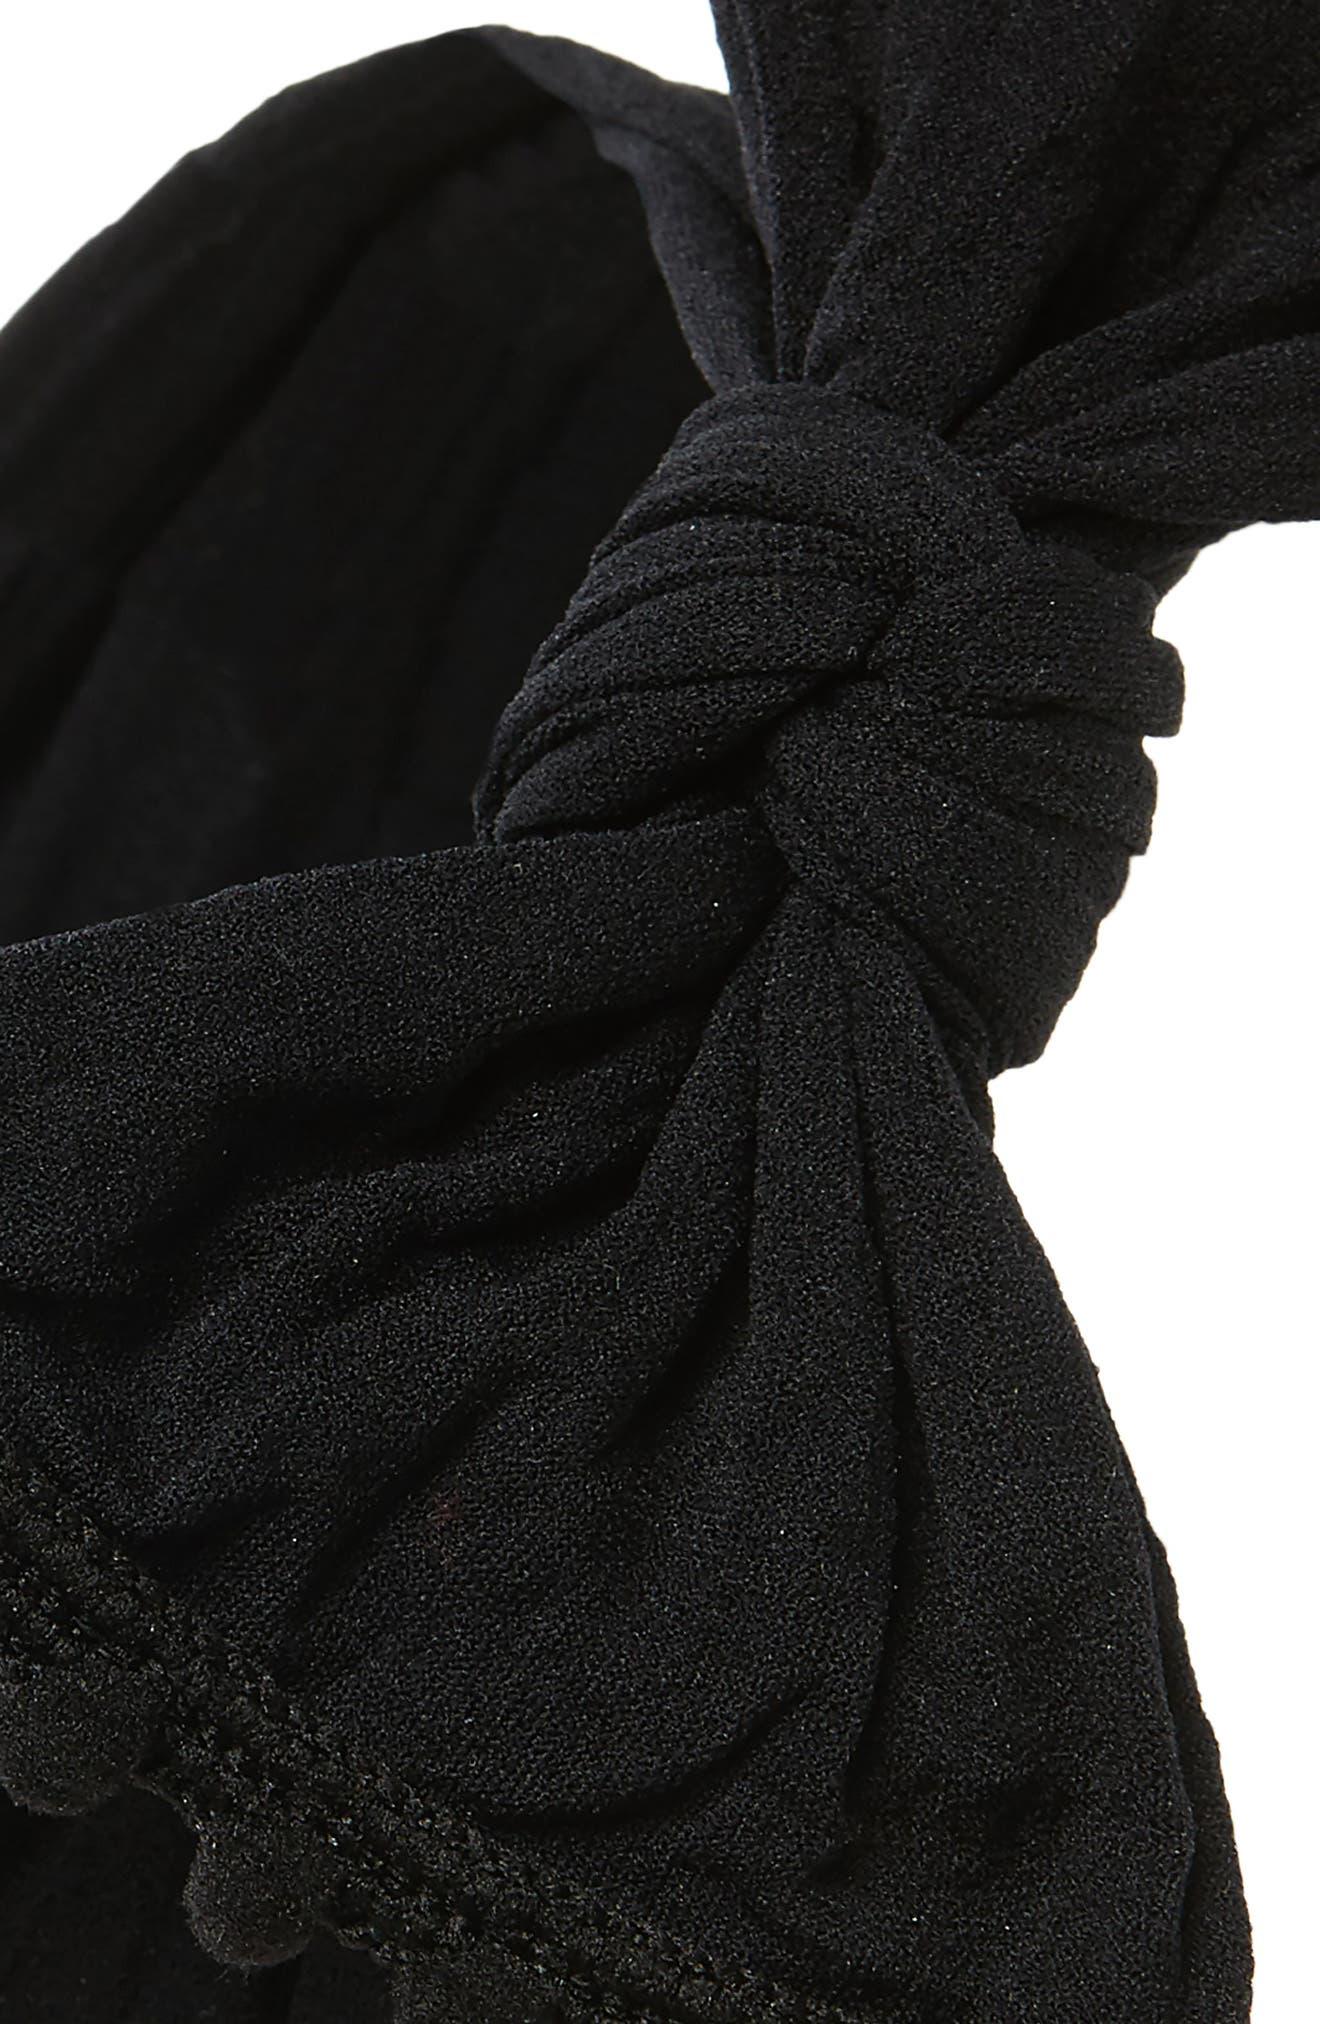 BABY BLING, Pompom Trim Headband, Alternate thumbnail 2, color, BLACK POM